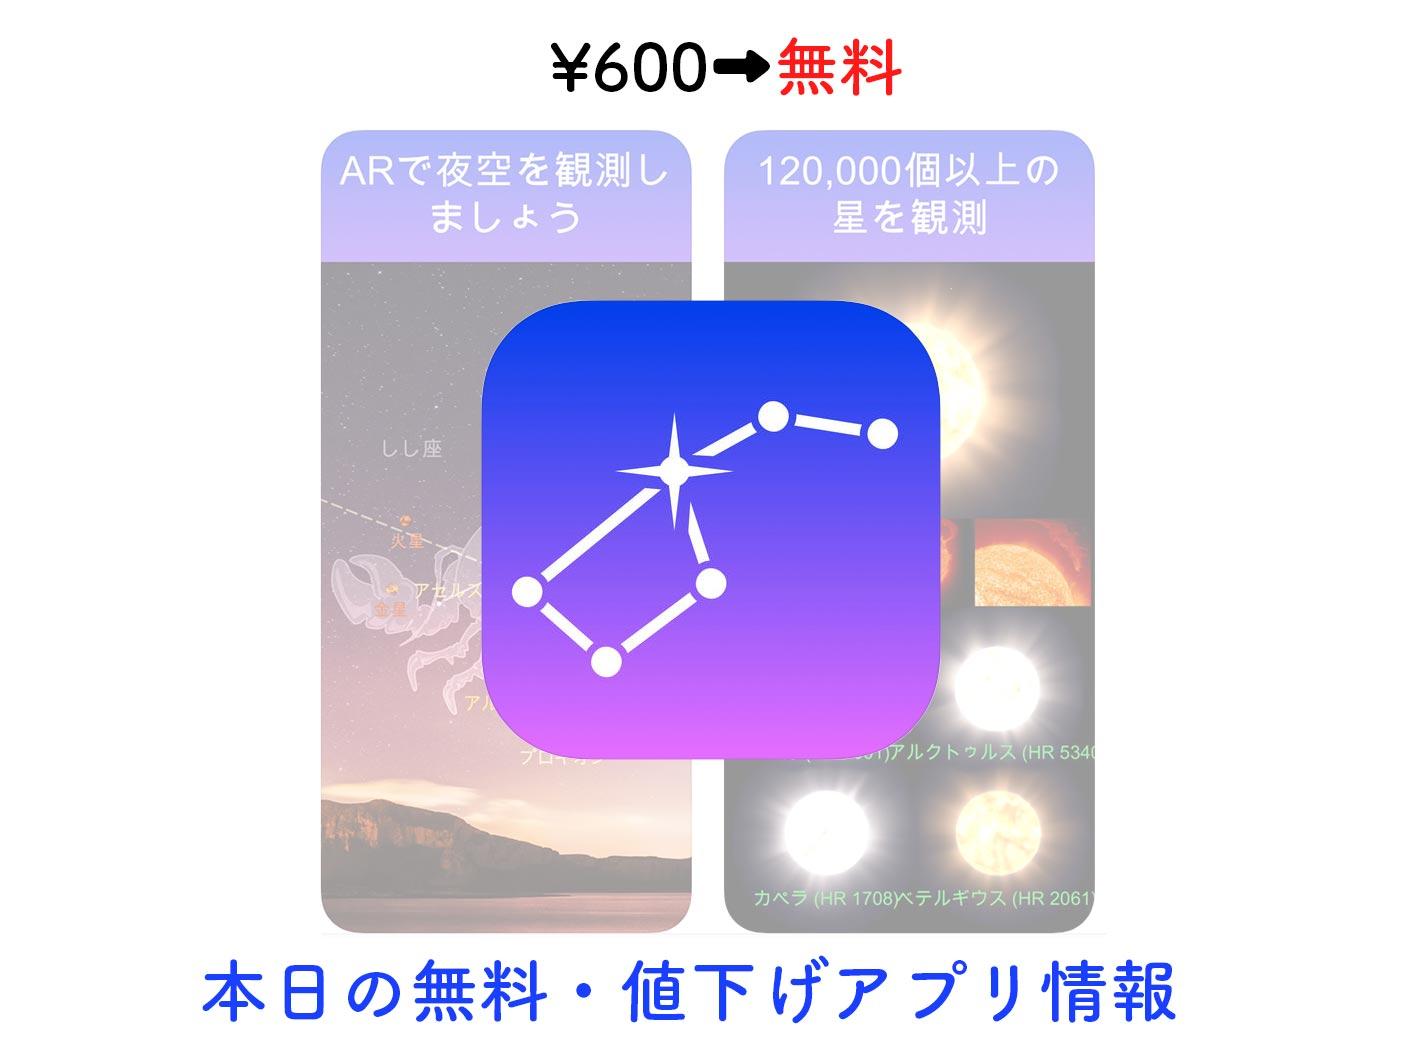 Appsale0801